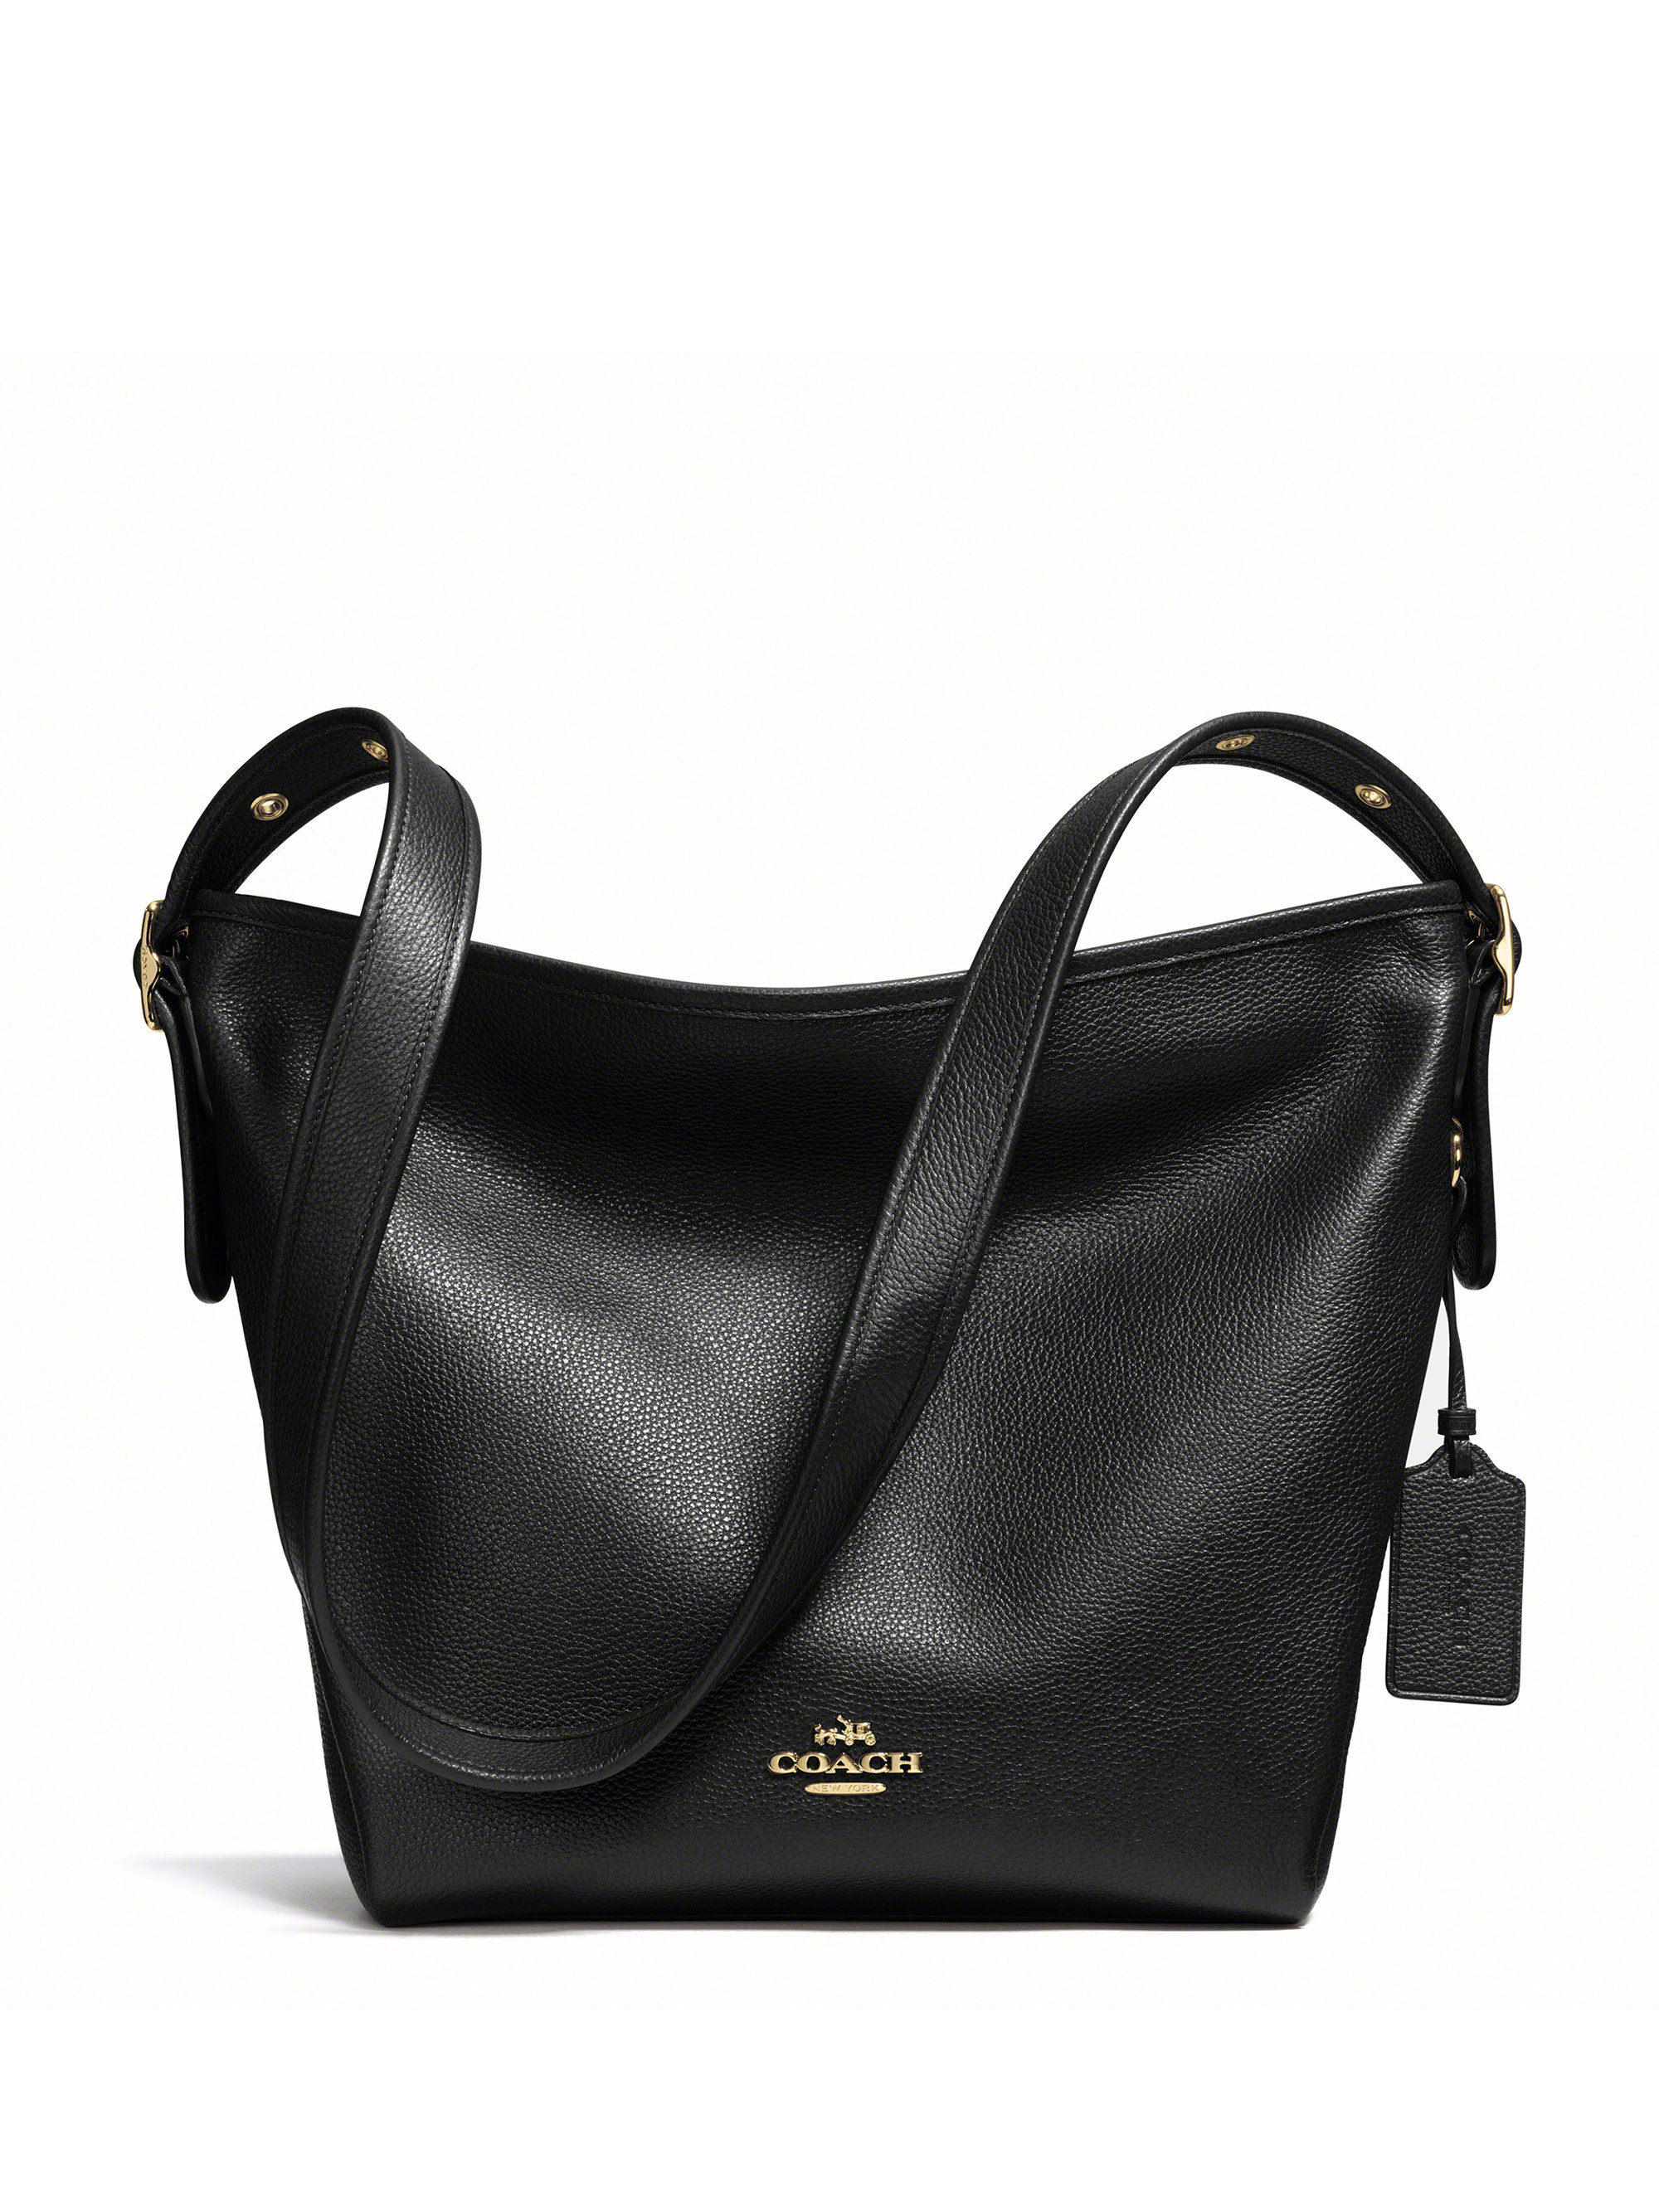 Lyst - COACH Dufflette Leather Shoulder Bag in Black